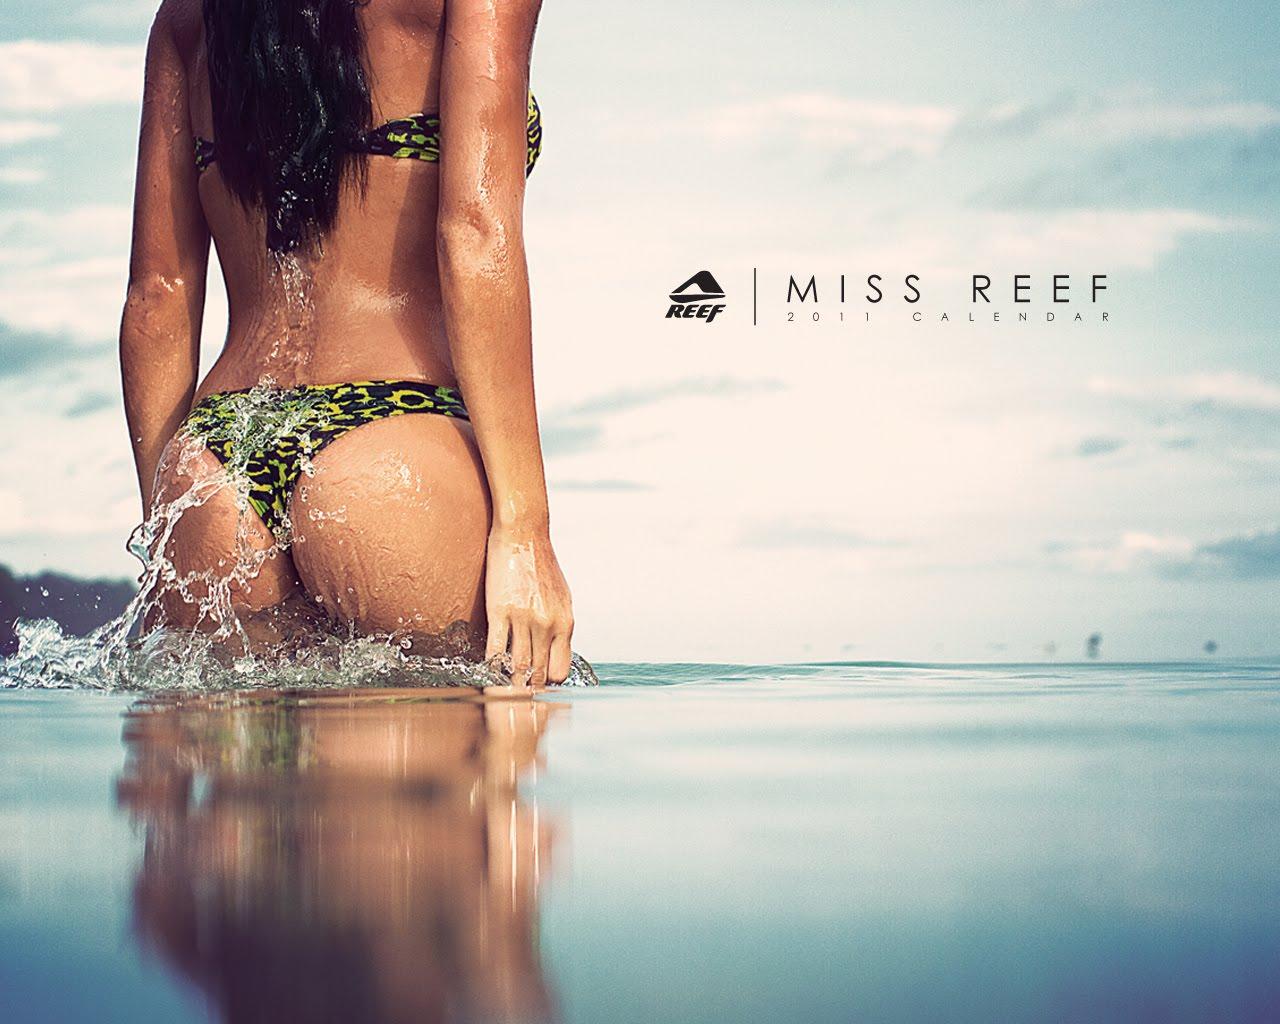 Calendrier Miss Reef 2011 Disponible Au Shop Licious Bodyboard Shop